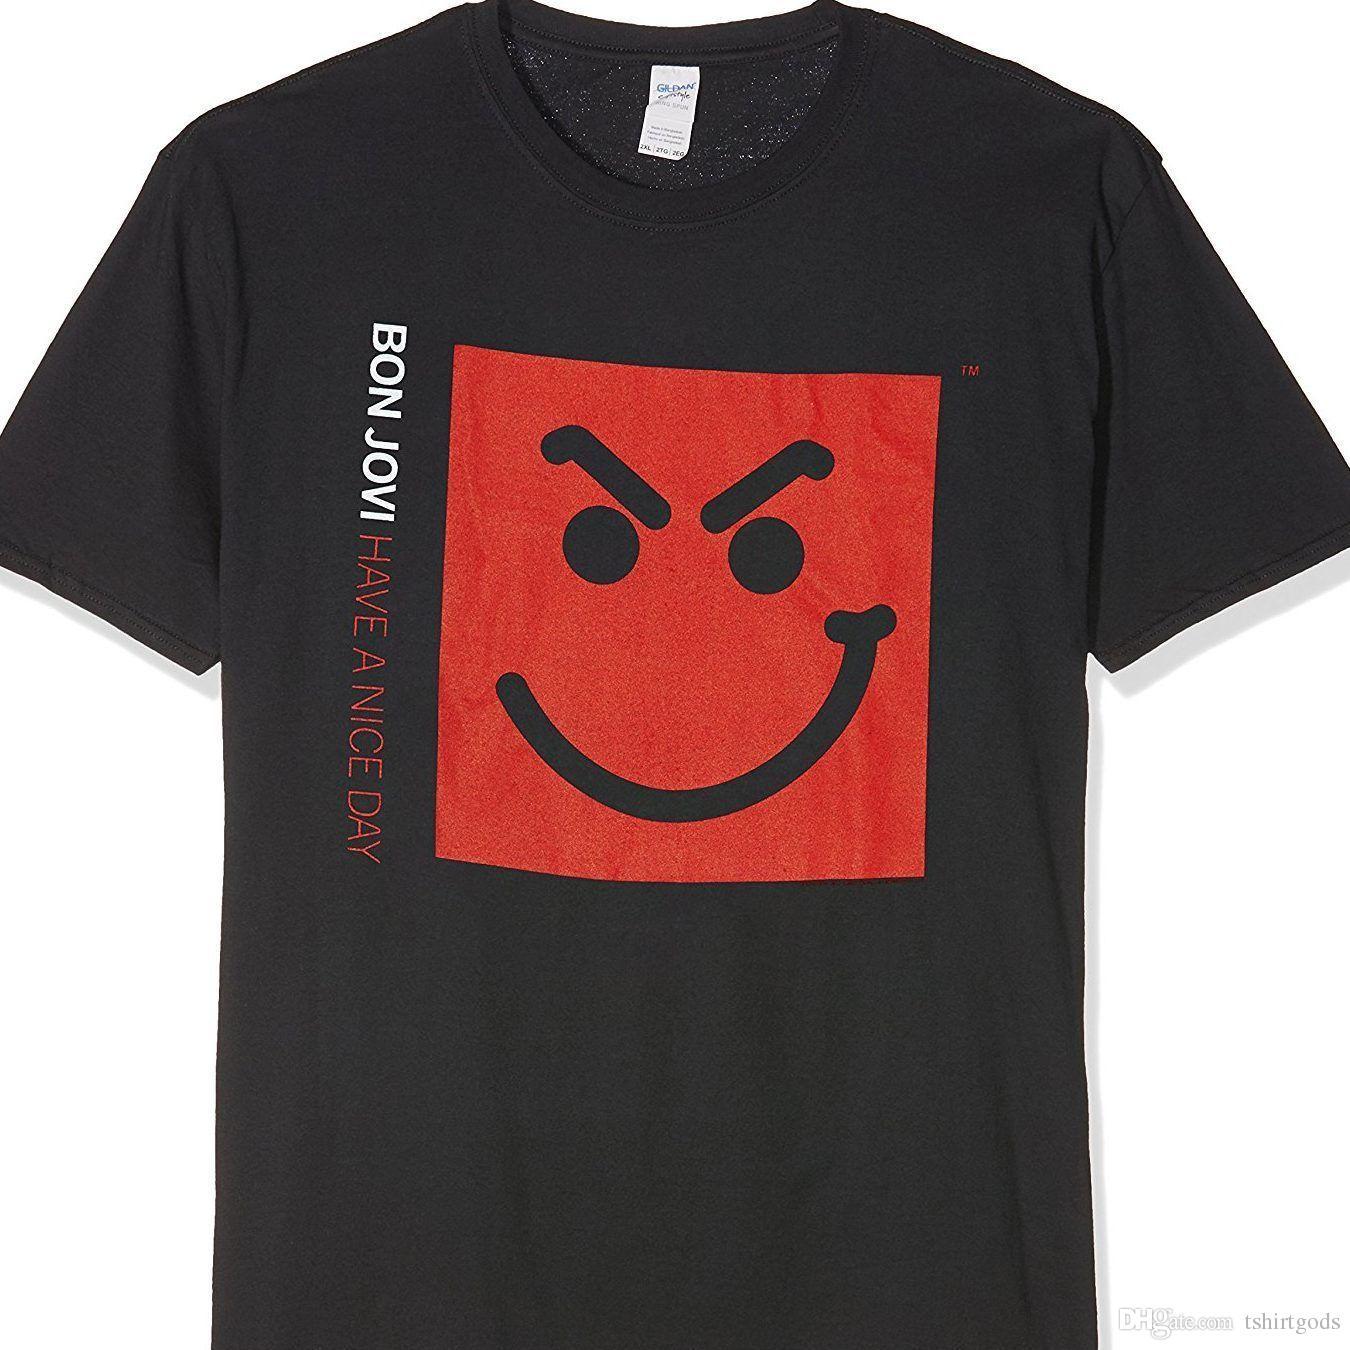 T Shirt TagliaS2xl Nice Jovi A Bon Day Acquista SmirkHave j4R5LA